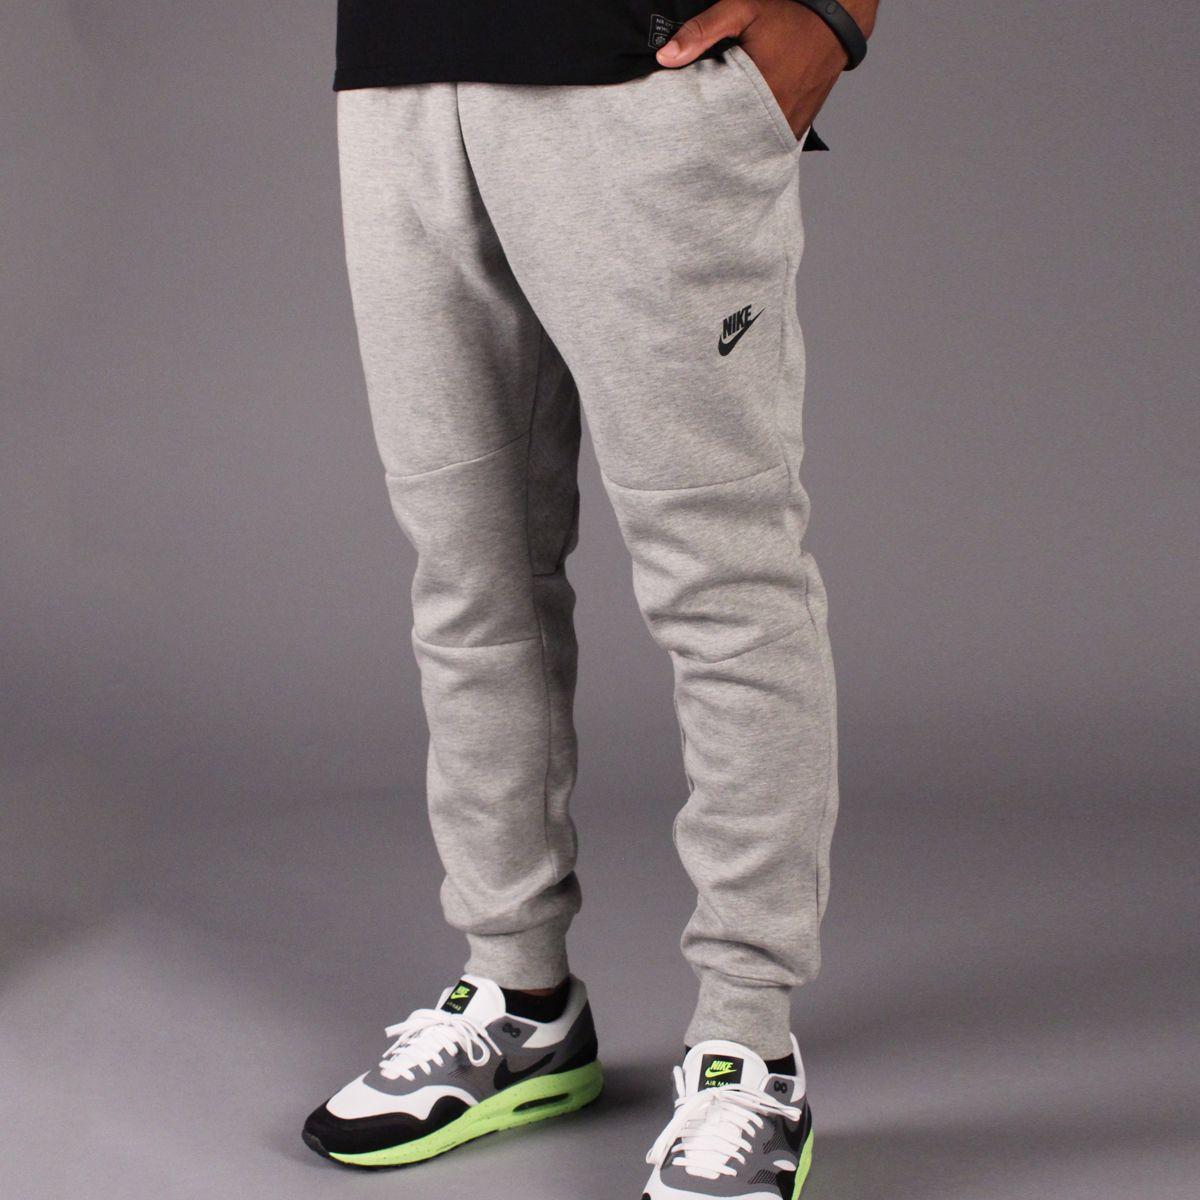 Nike Tech Fleece Pant 1MM (Dark Heather Grey/Black